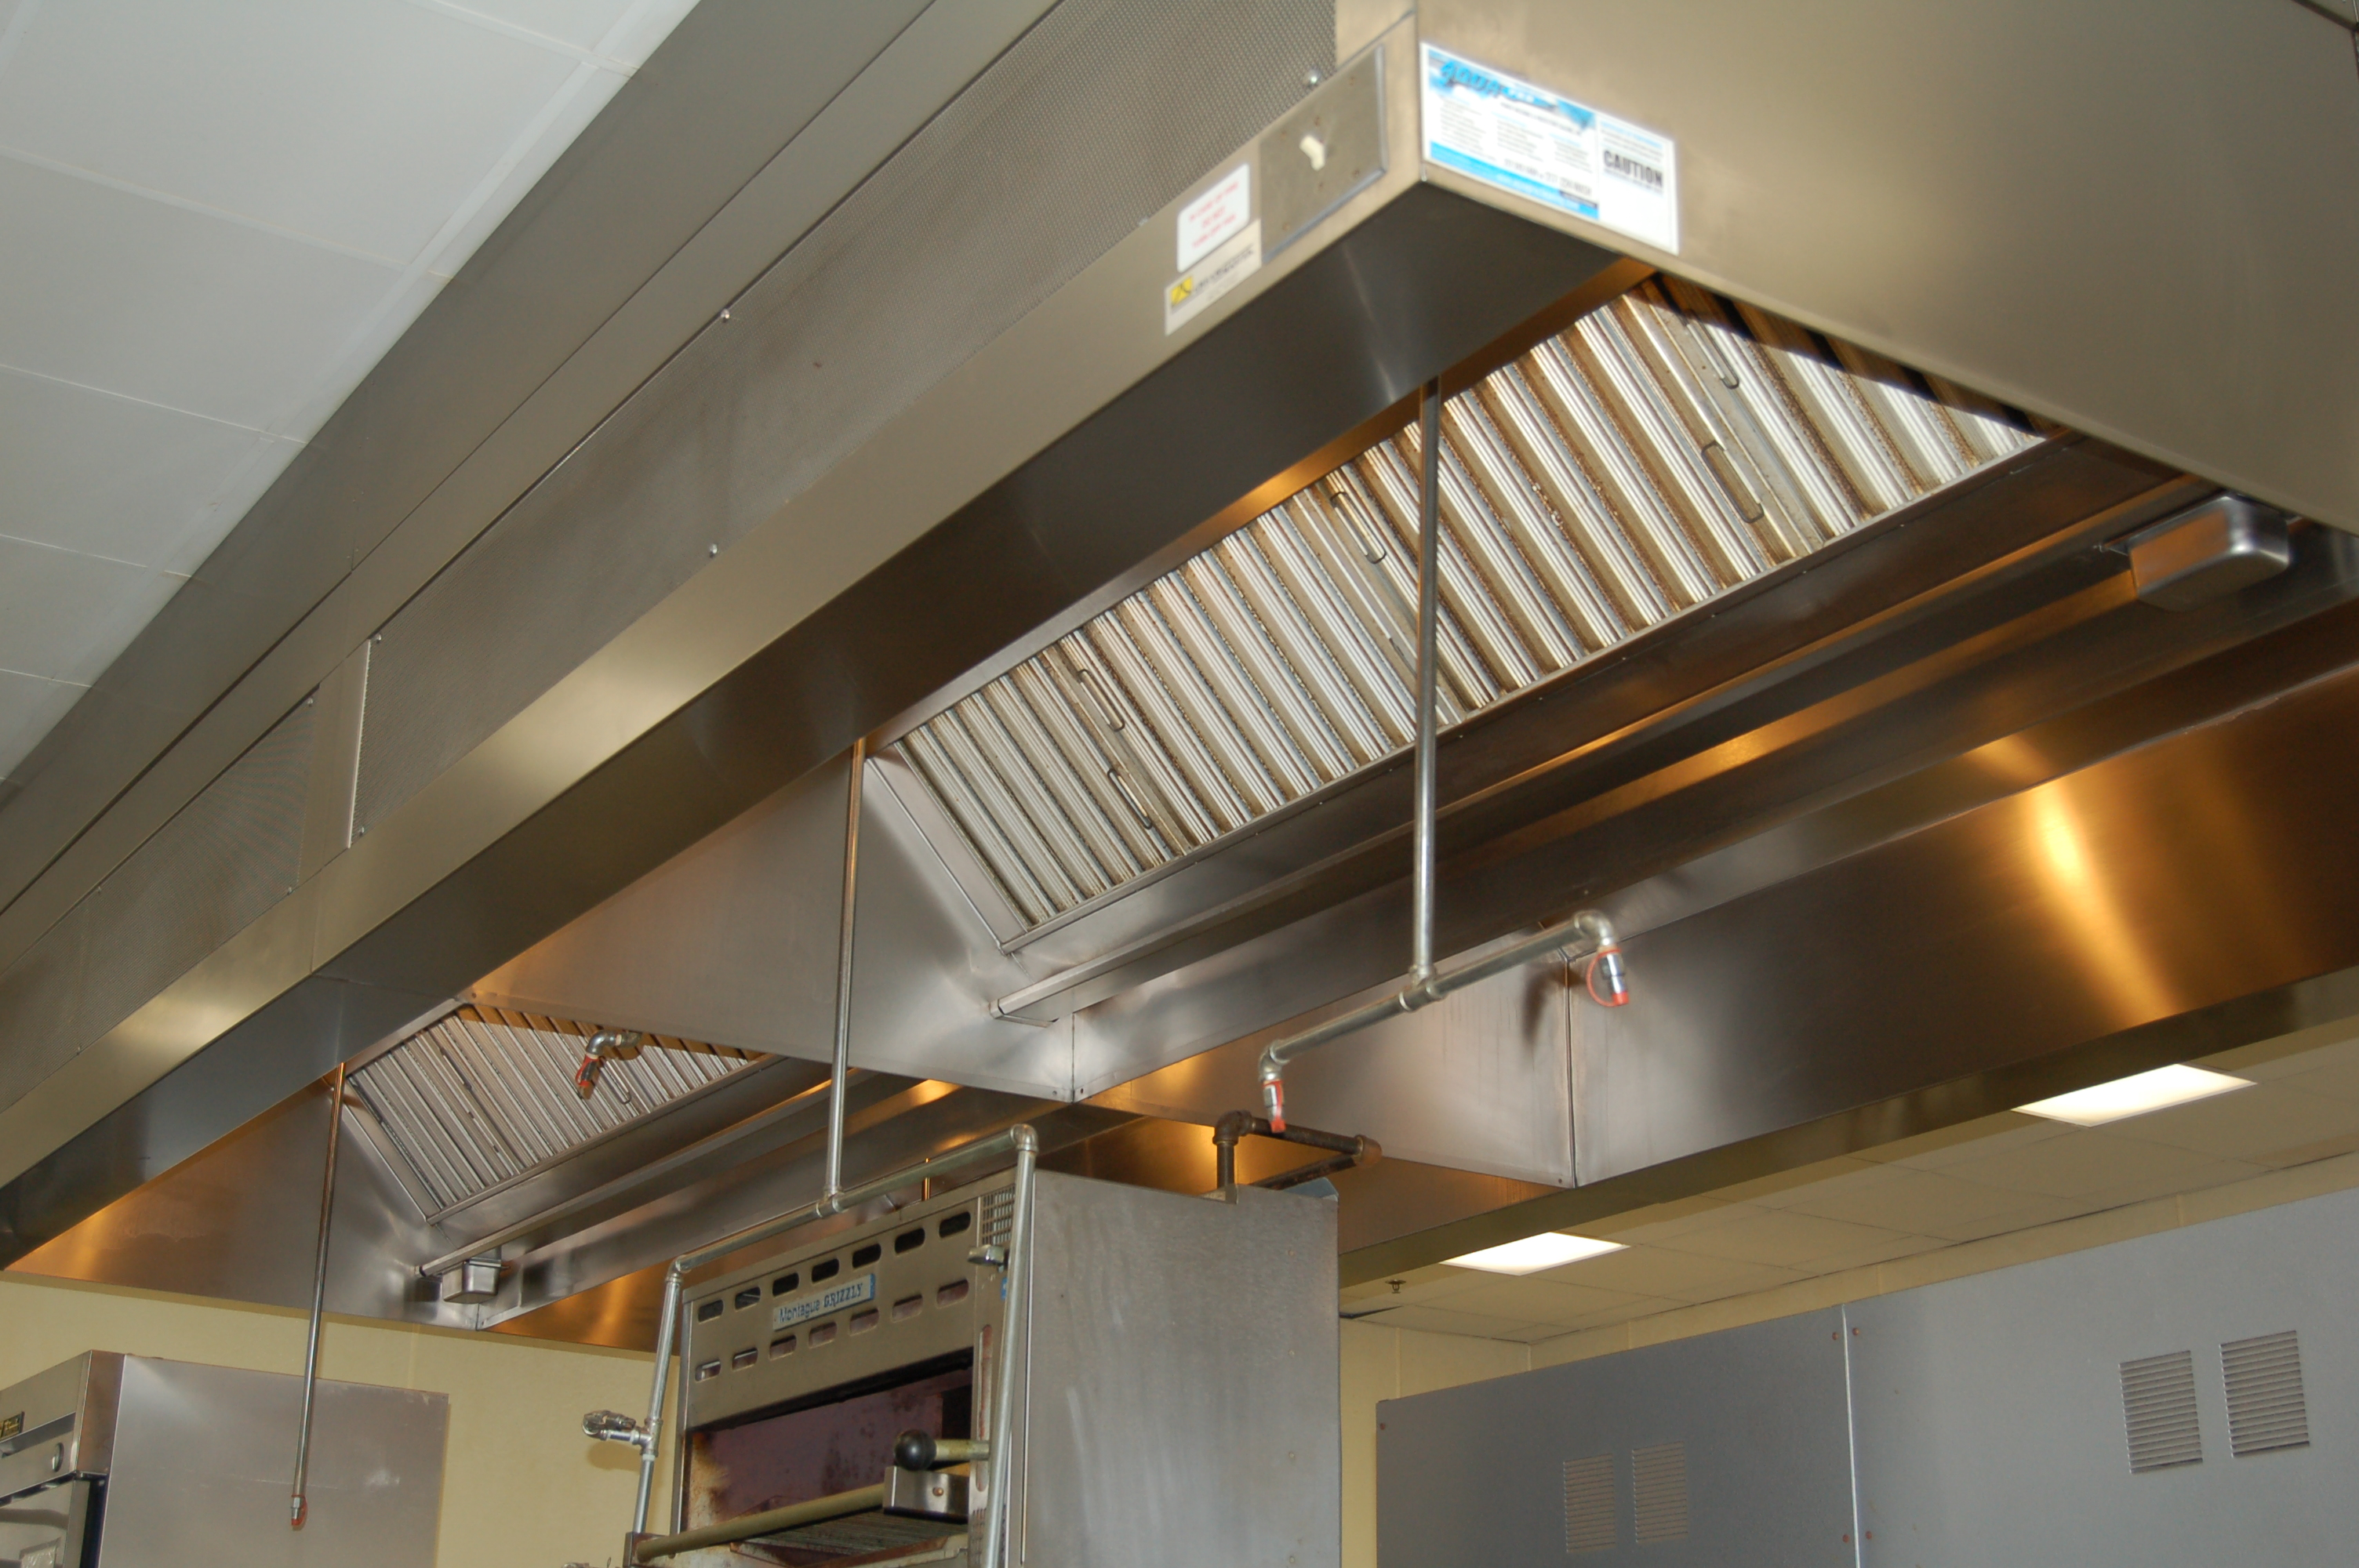 commercial kitchen ventilation cast iron sinks for sale services aqua pro cleaning